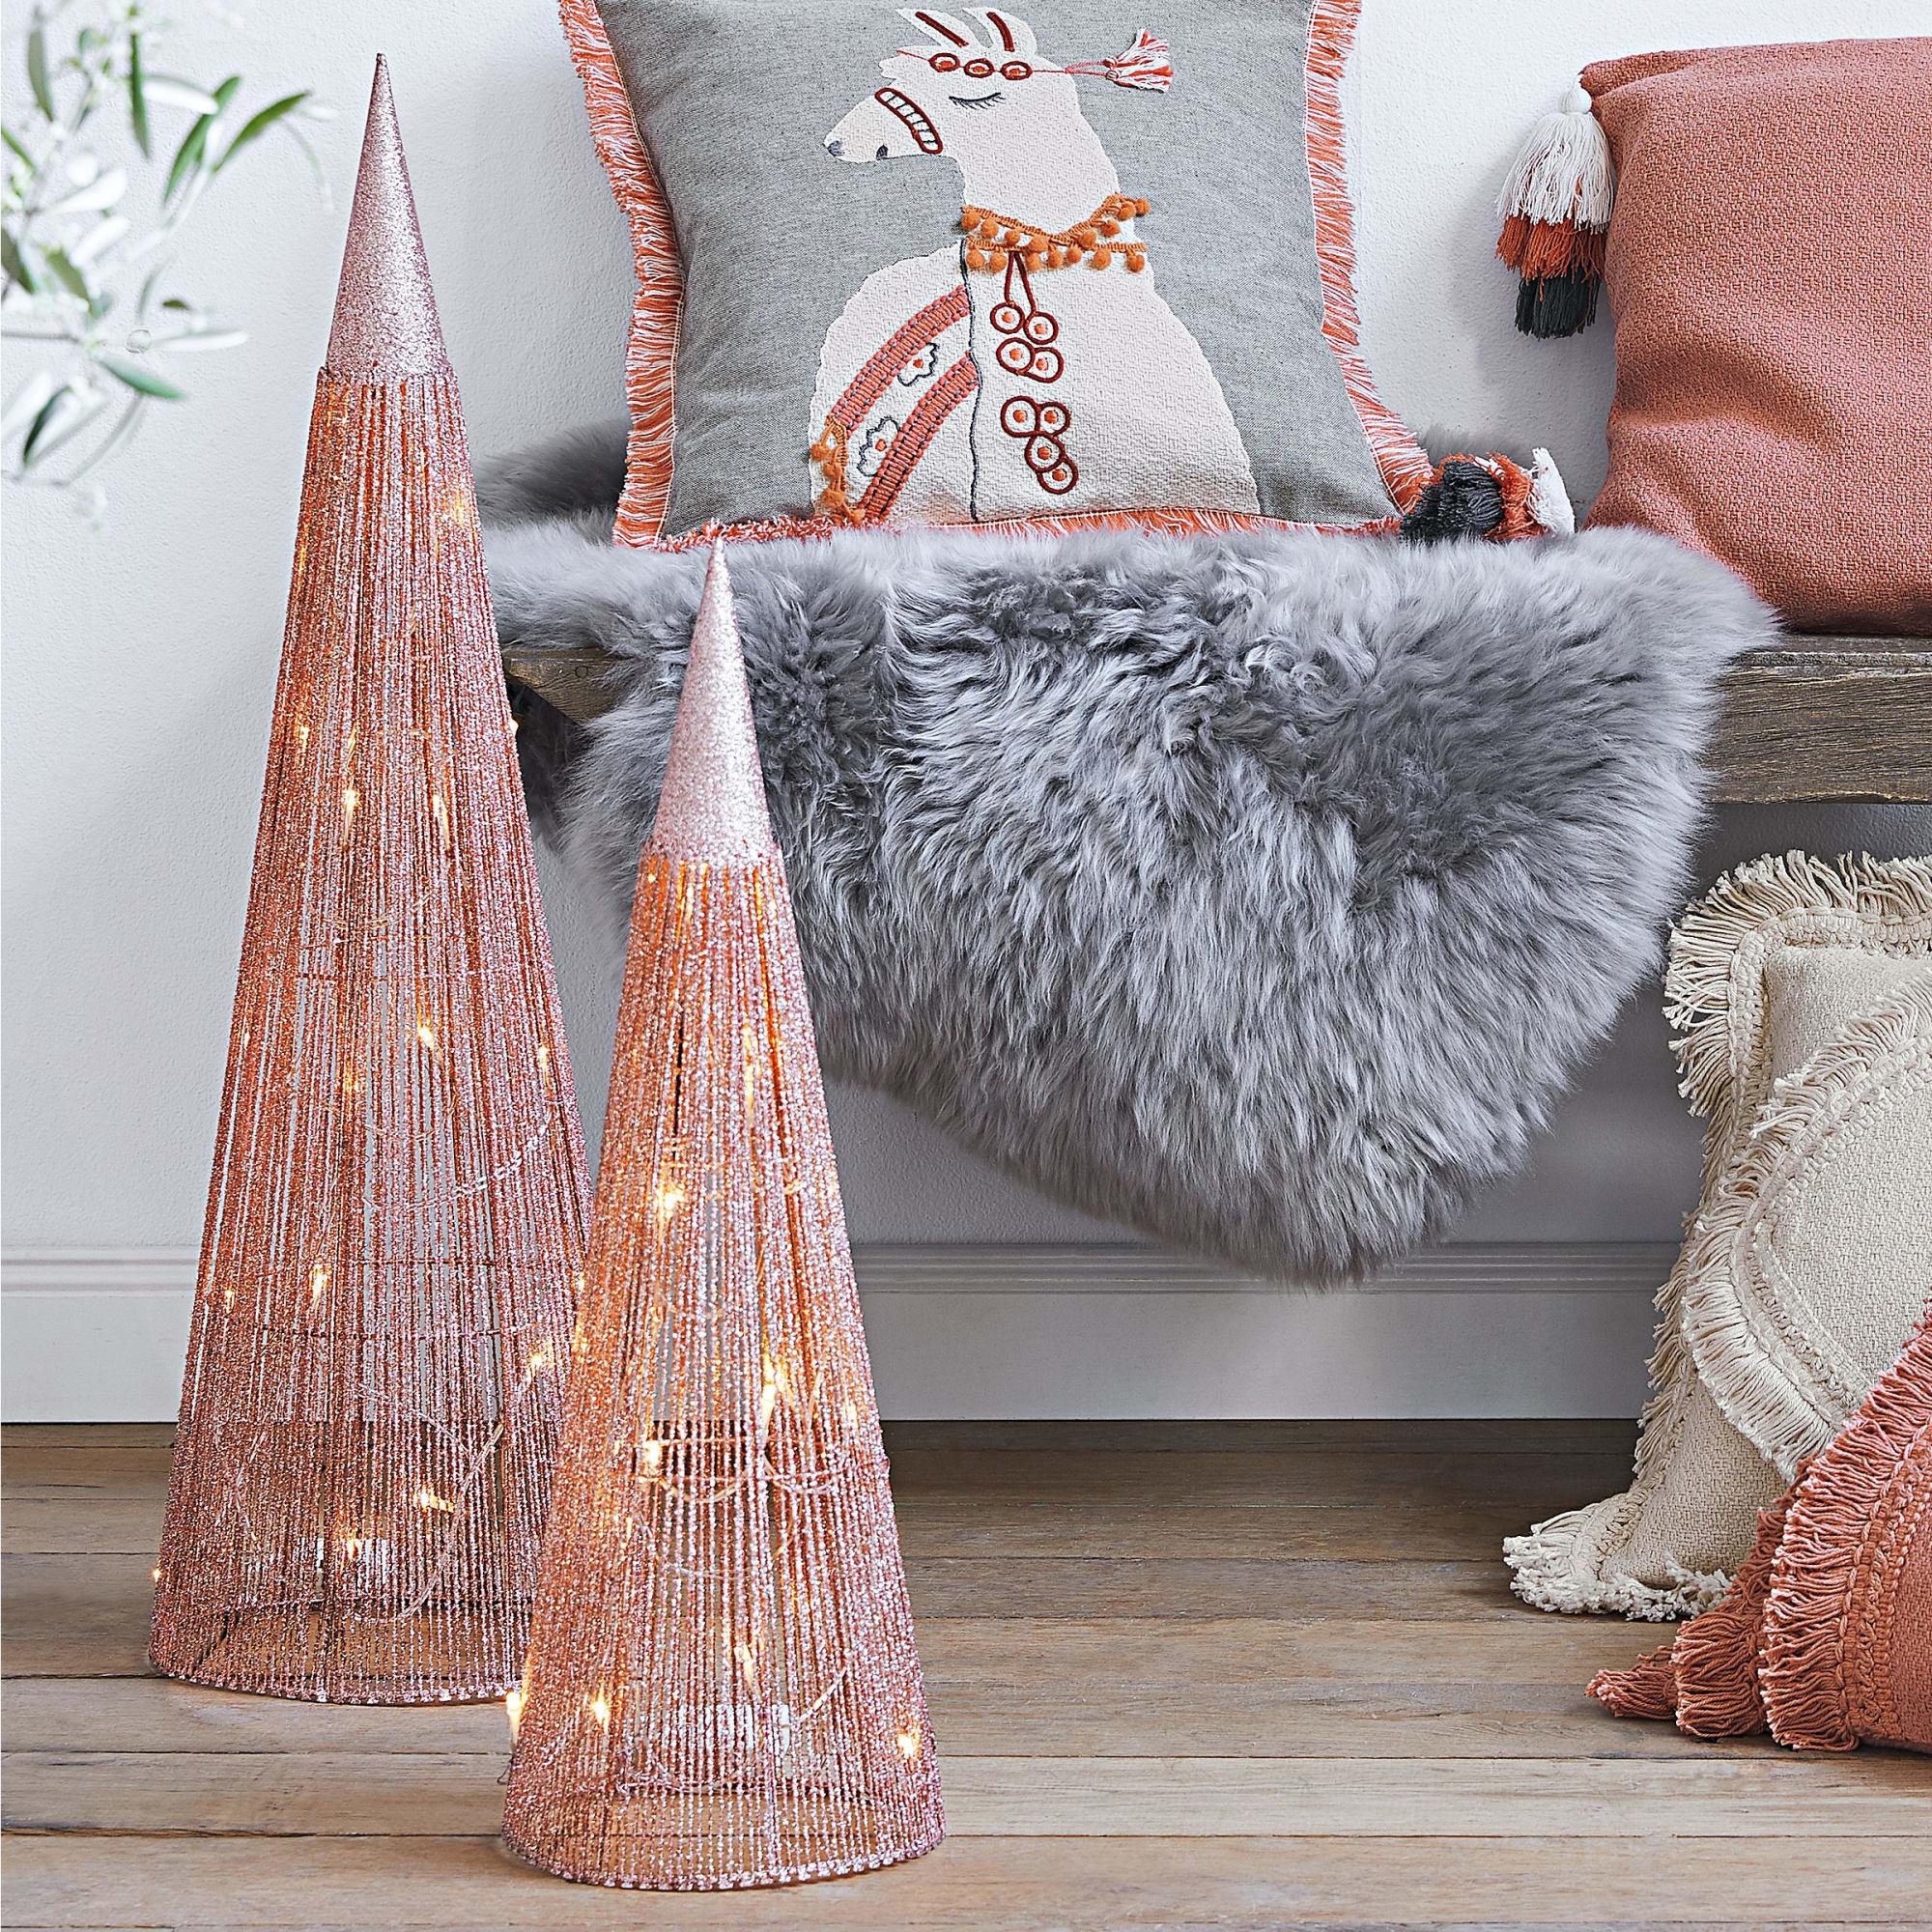 Weihnachtsbeleuchtung Kegel.Led Deko Kegel Set 2 Tlg Rose Mit Rosafarbenen Glitzerfäden Ca H 55 75 Cm